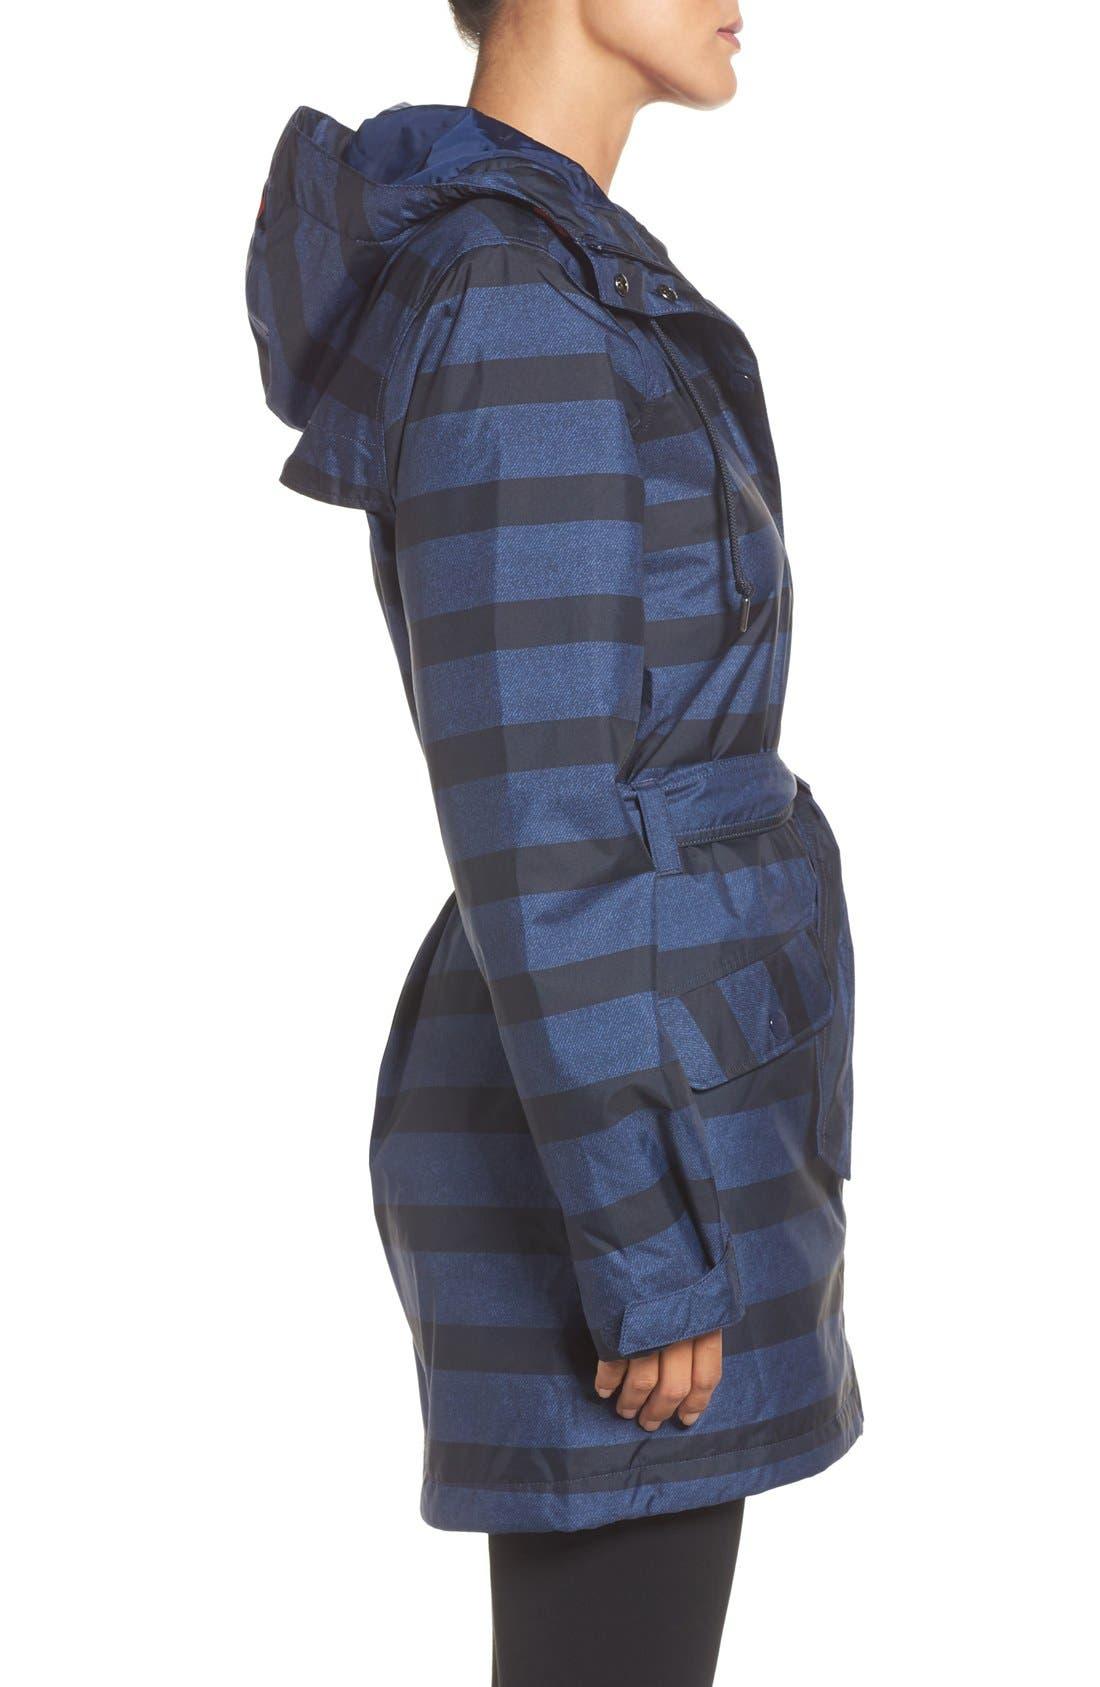 Alternate Image 3  - HellyHansen 'Lyness' Insulated Waterproof Coat